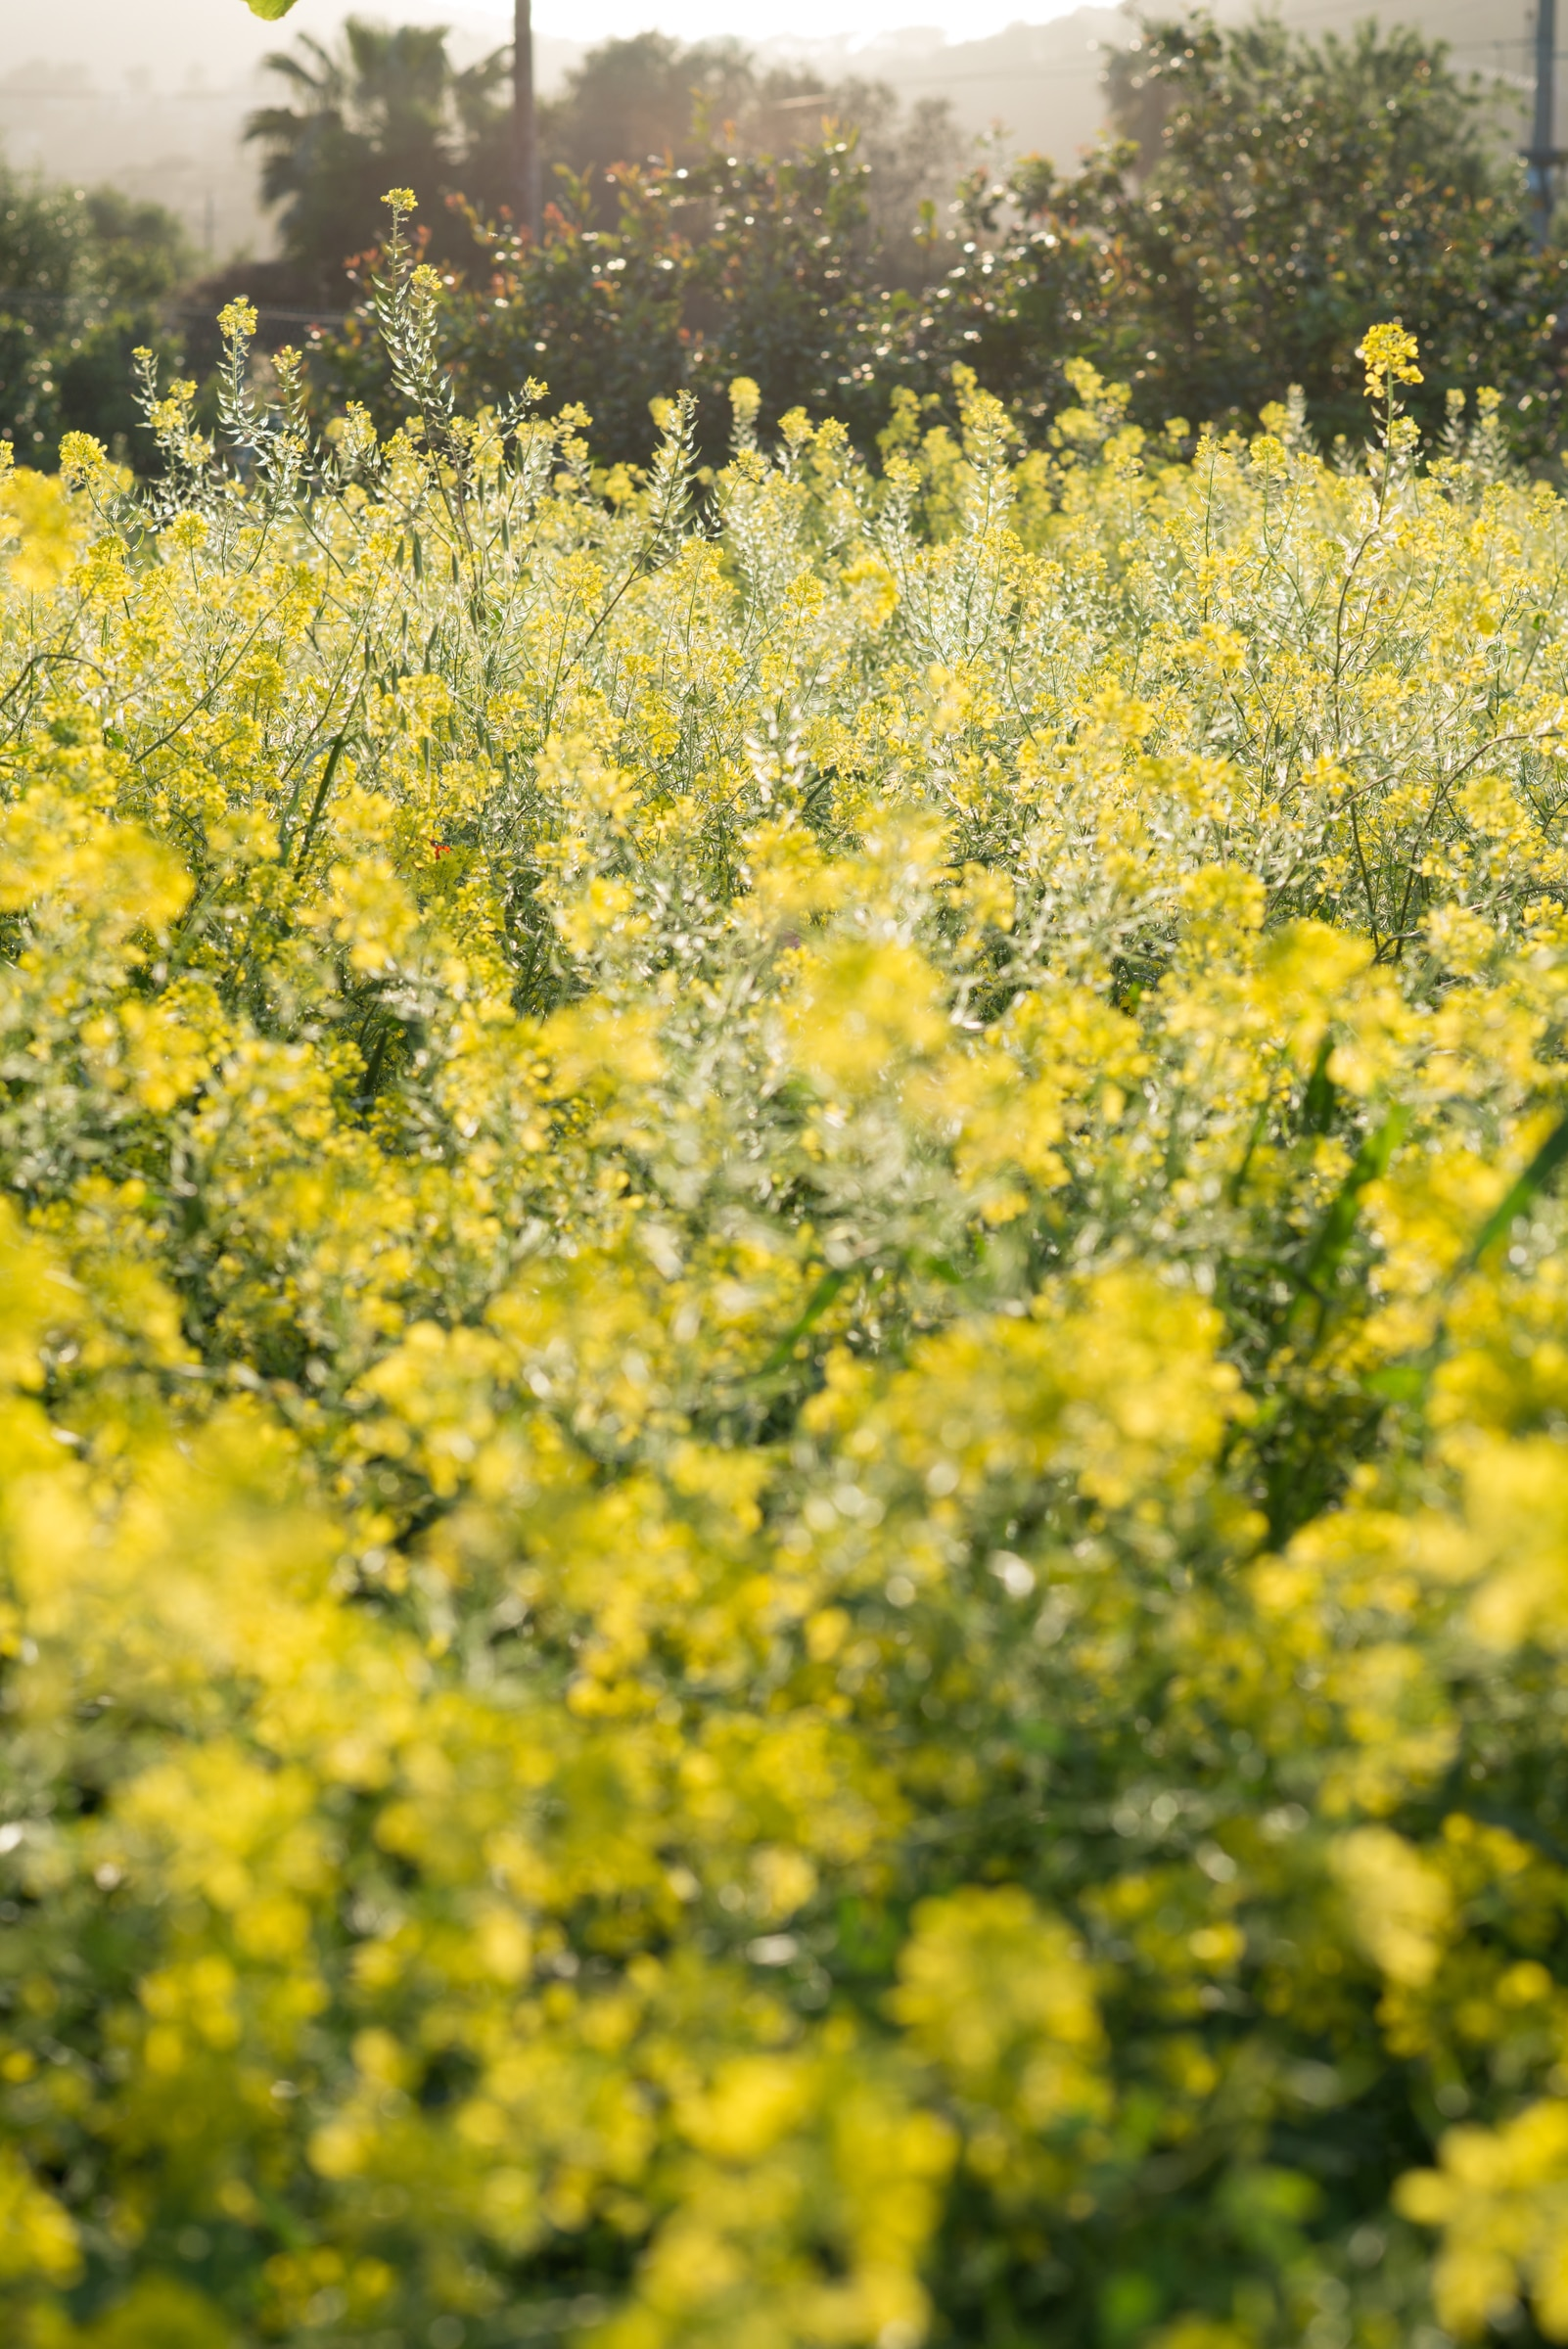 20140408 8721 - Mallorca in Spring